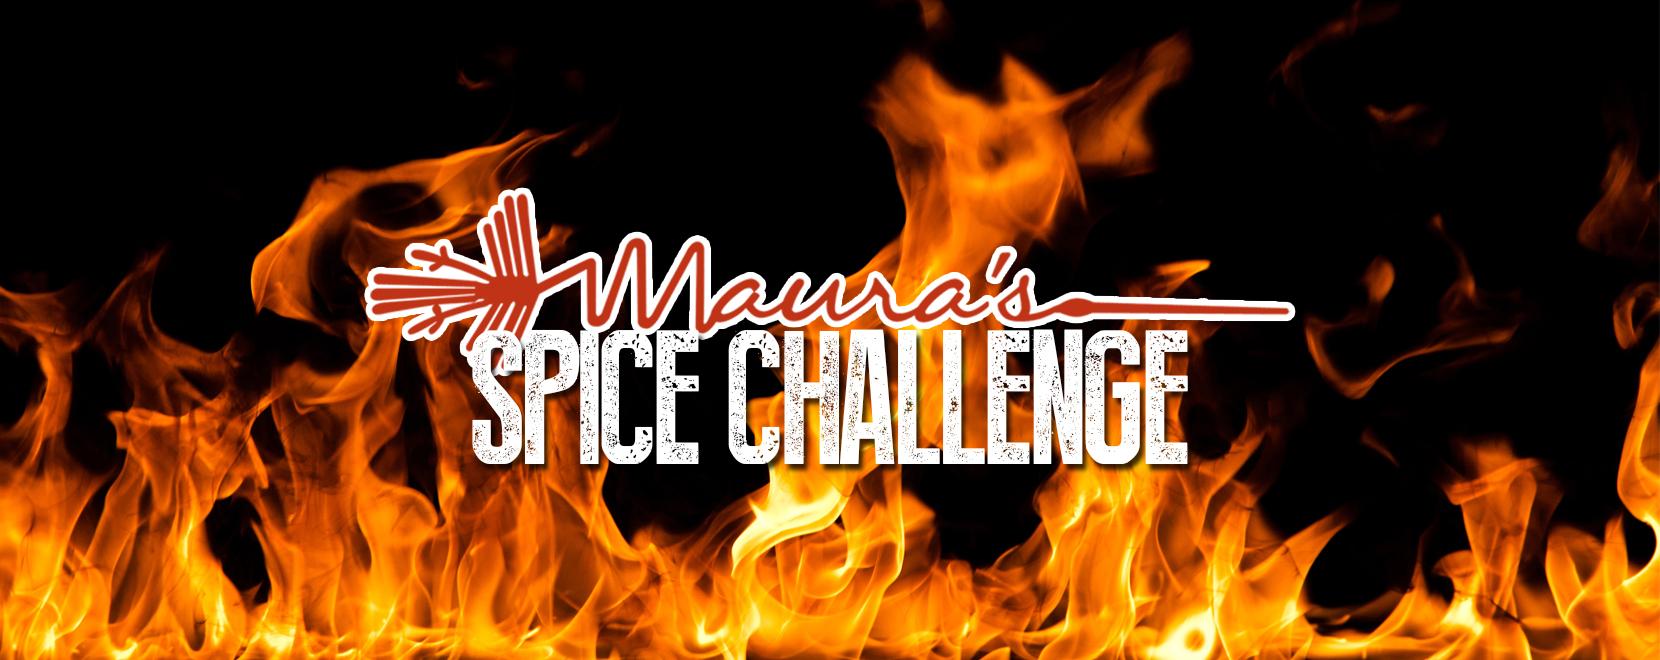 fire background spice challenge